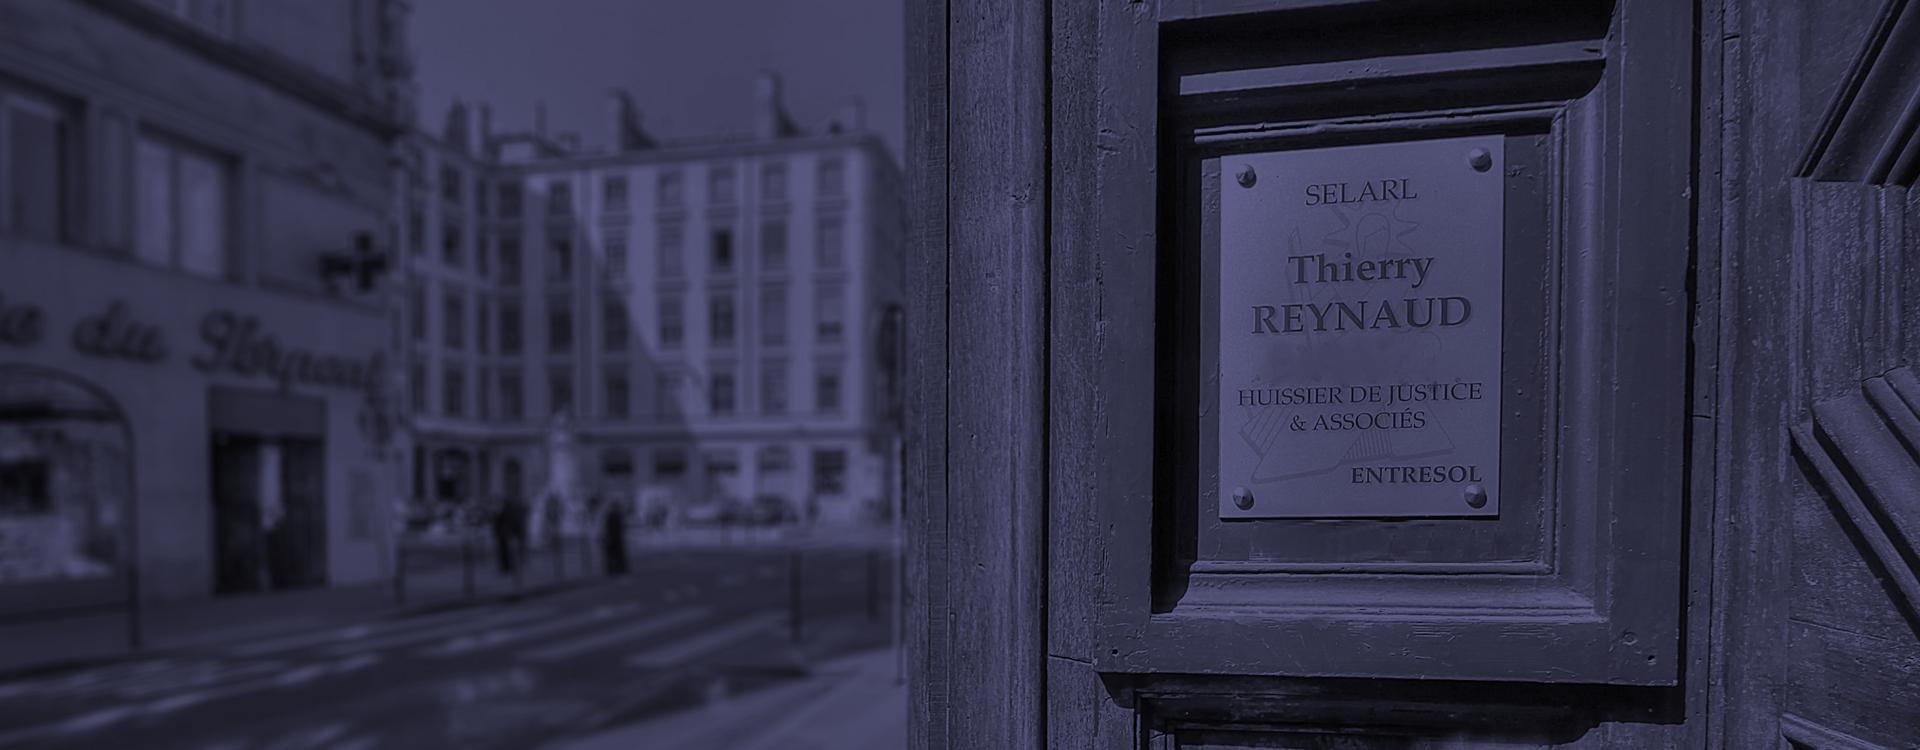 thierry-reynaud-huissier-lyon-slider3